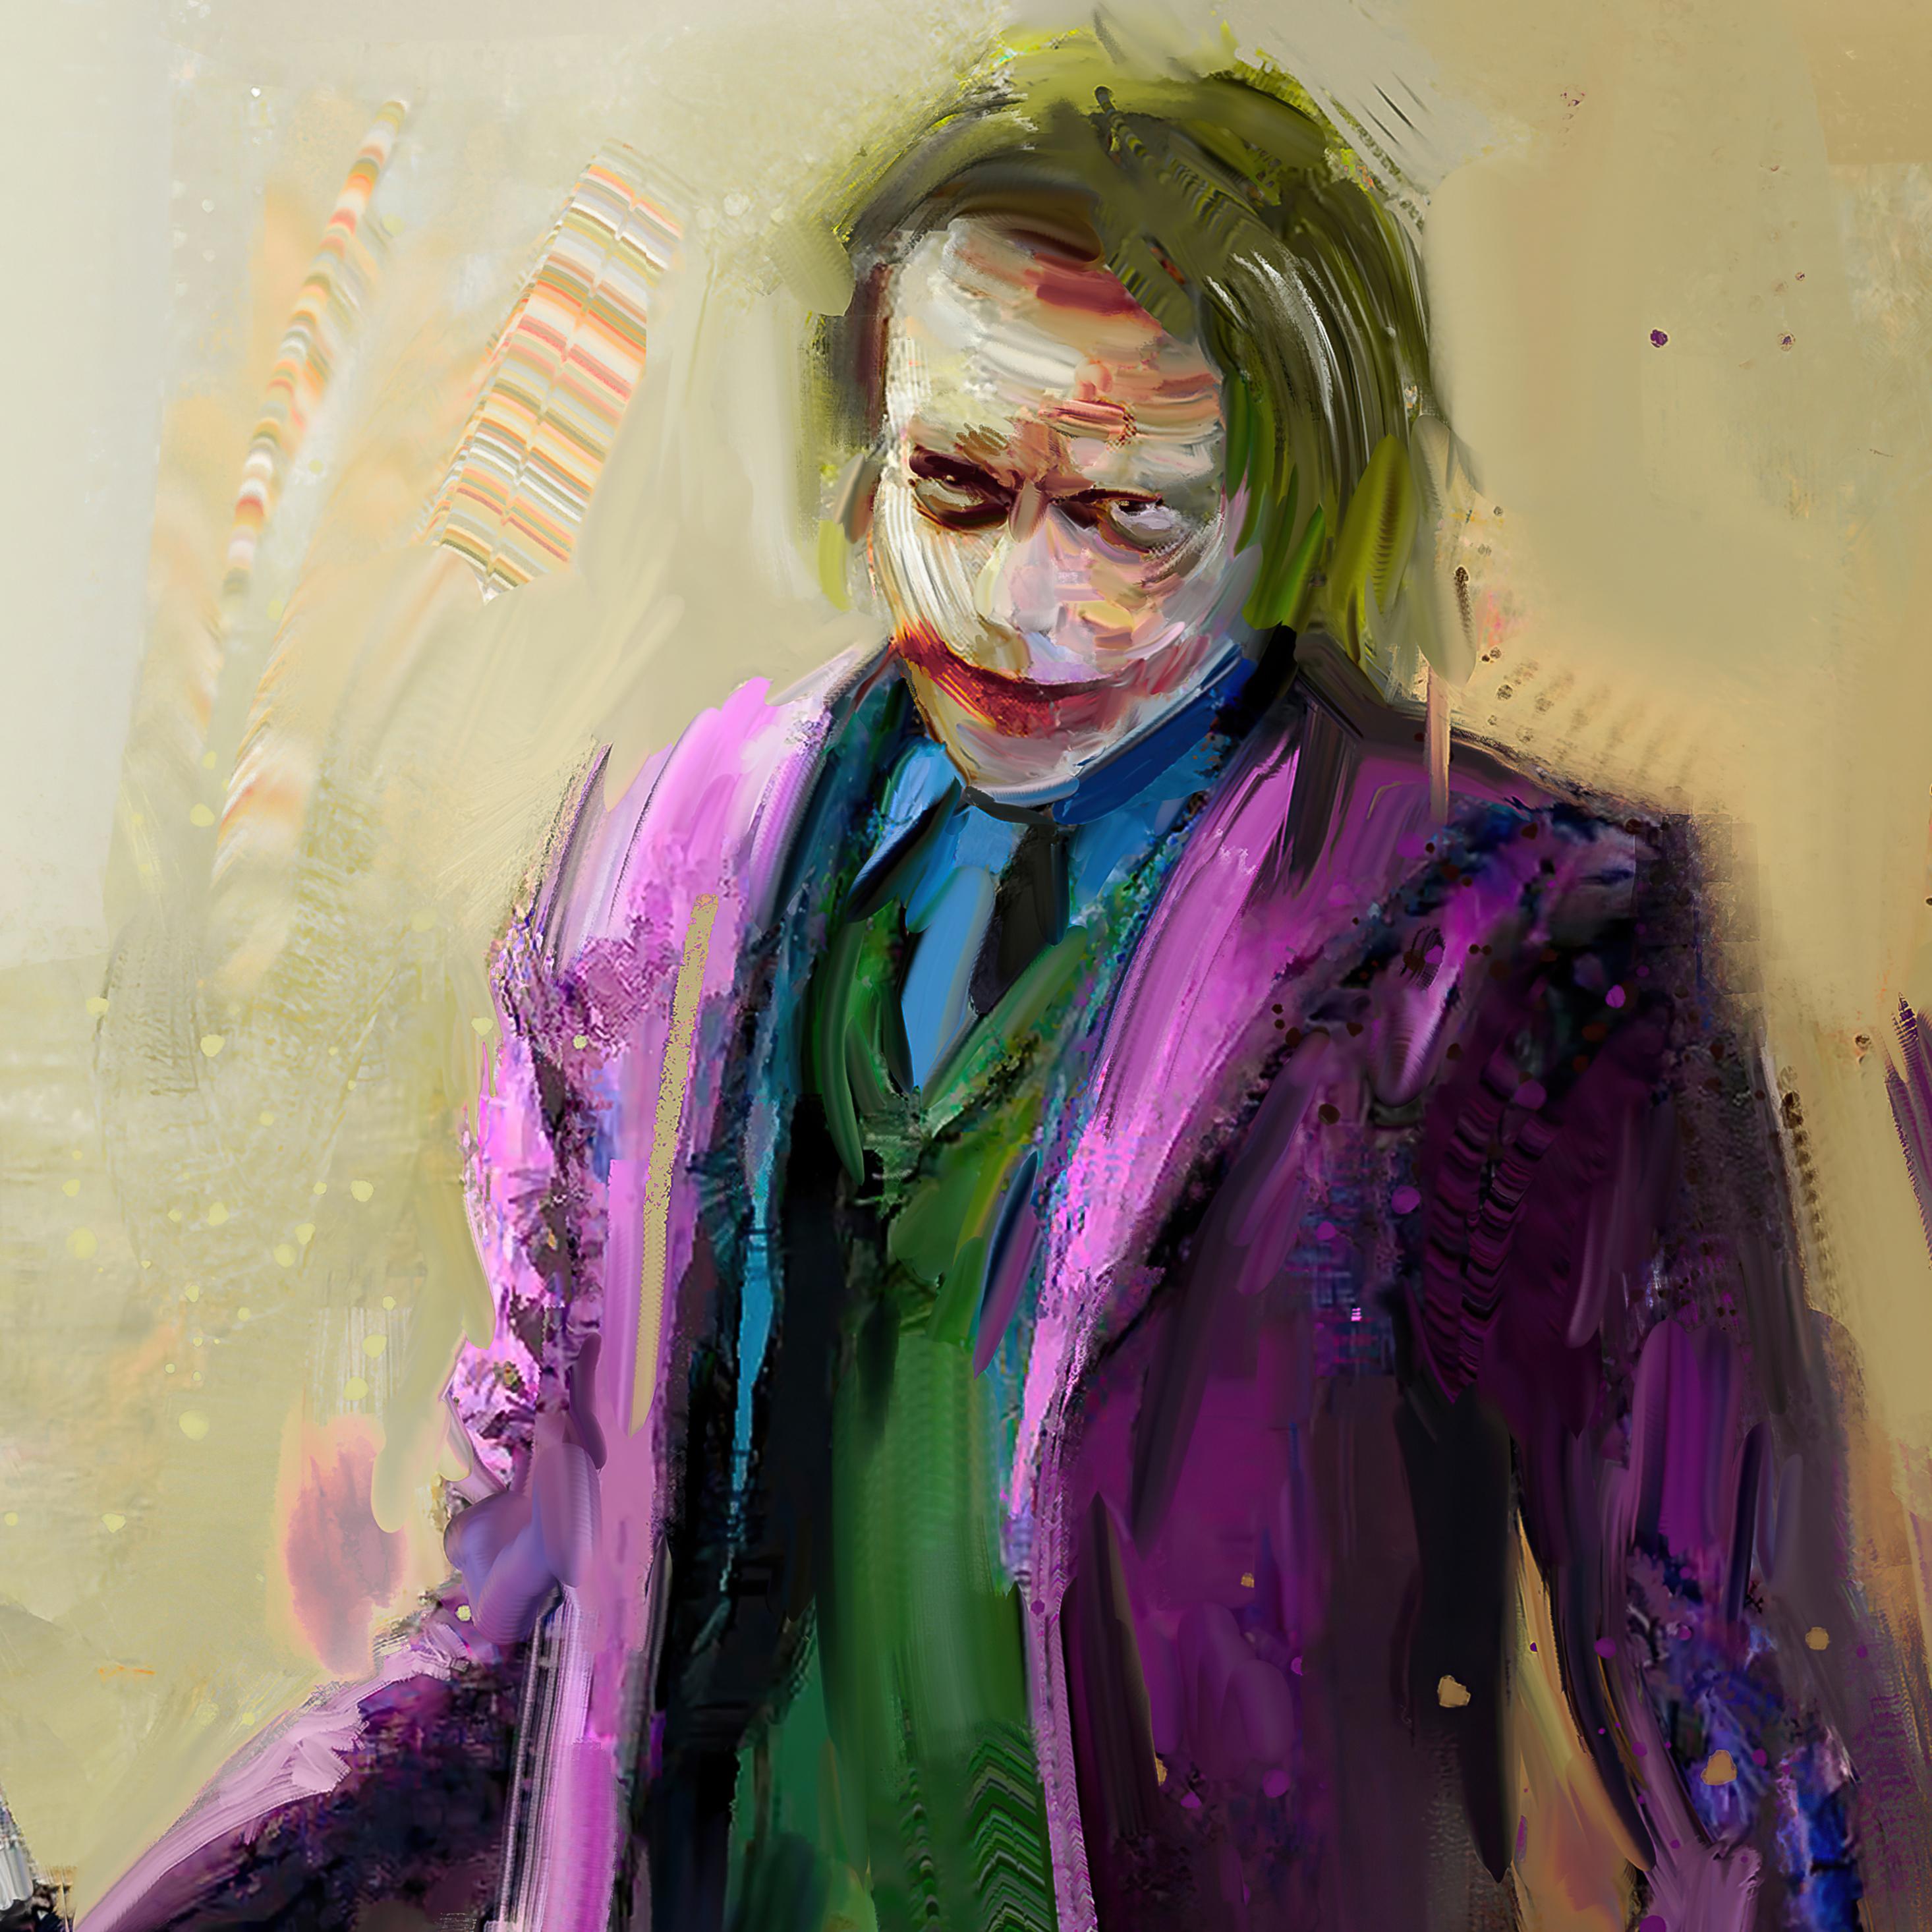 2020-joker-sketch-artwork-ri.jpg